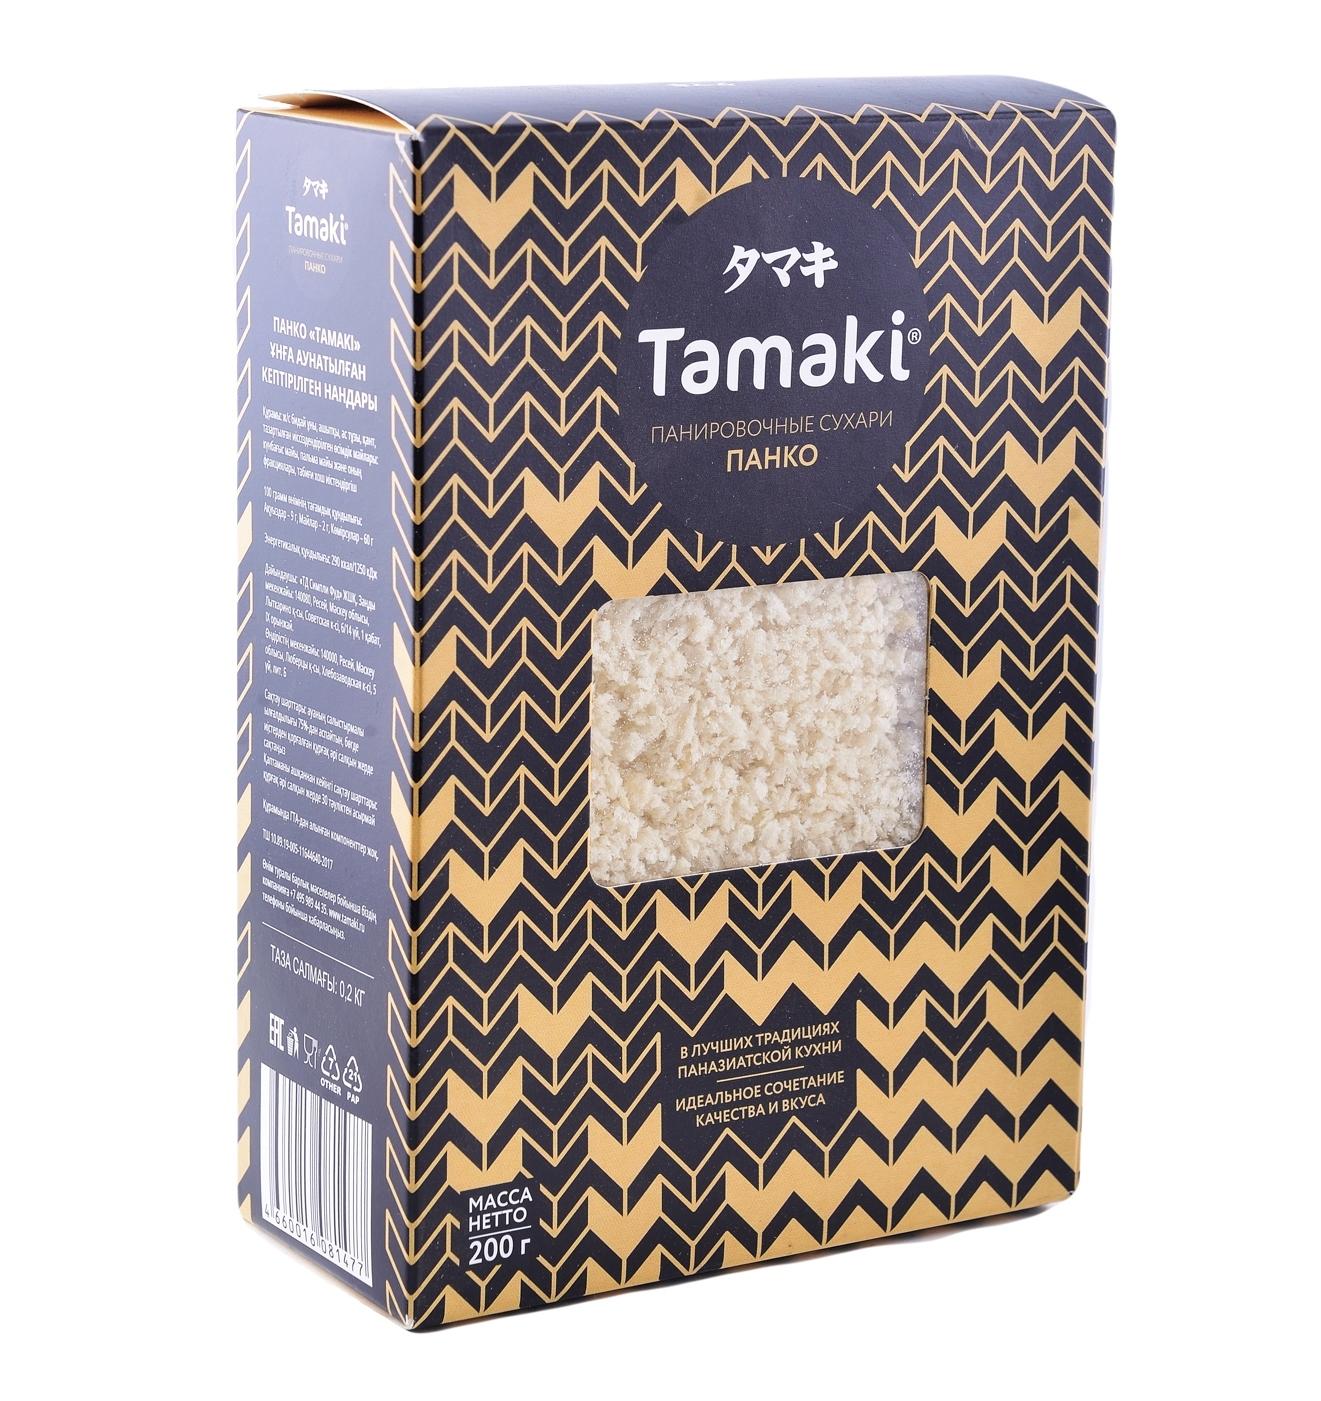 Сухари панировочные Панко Tamaki 200 г